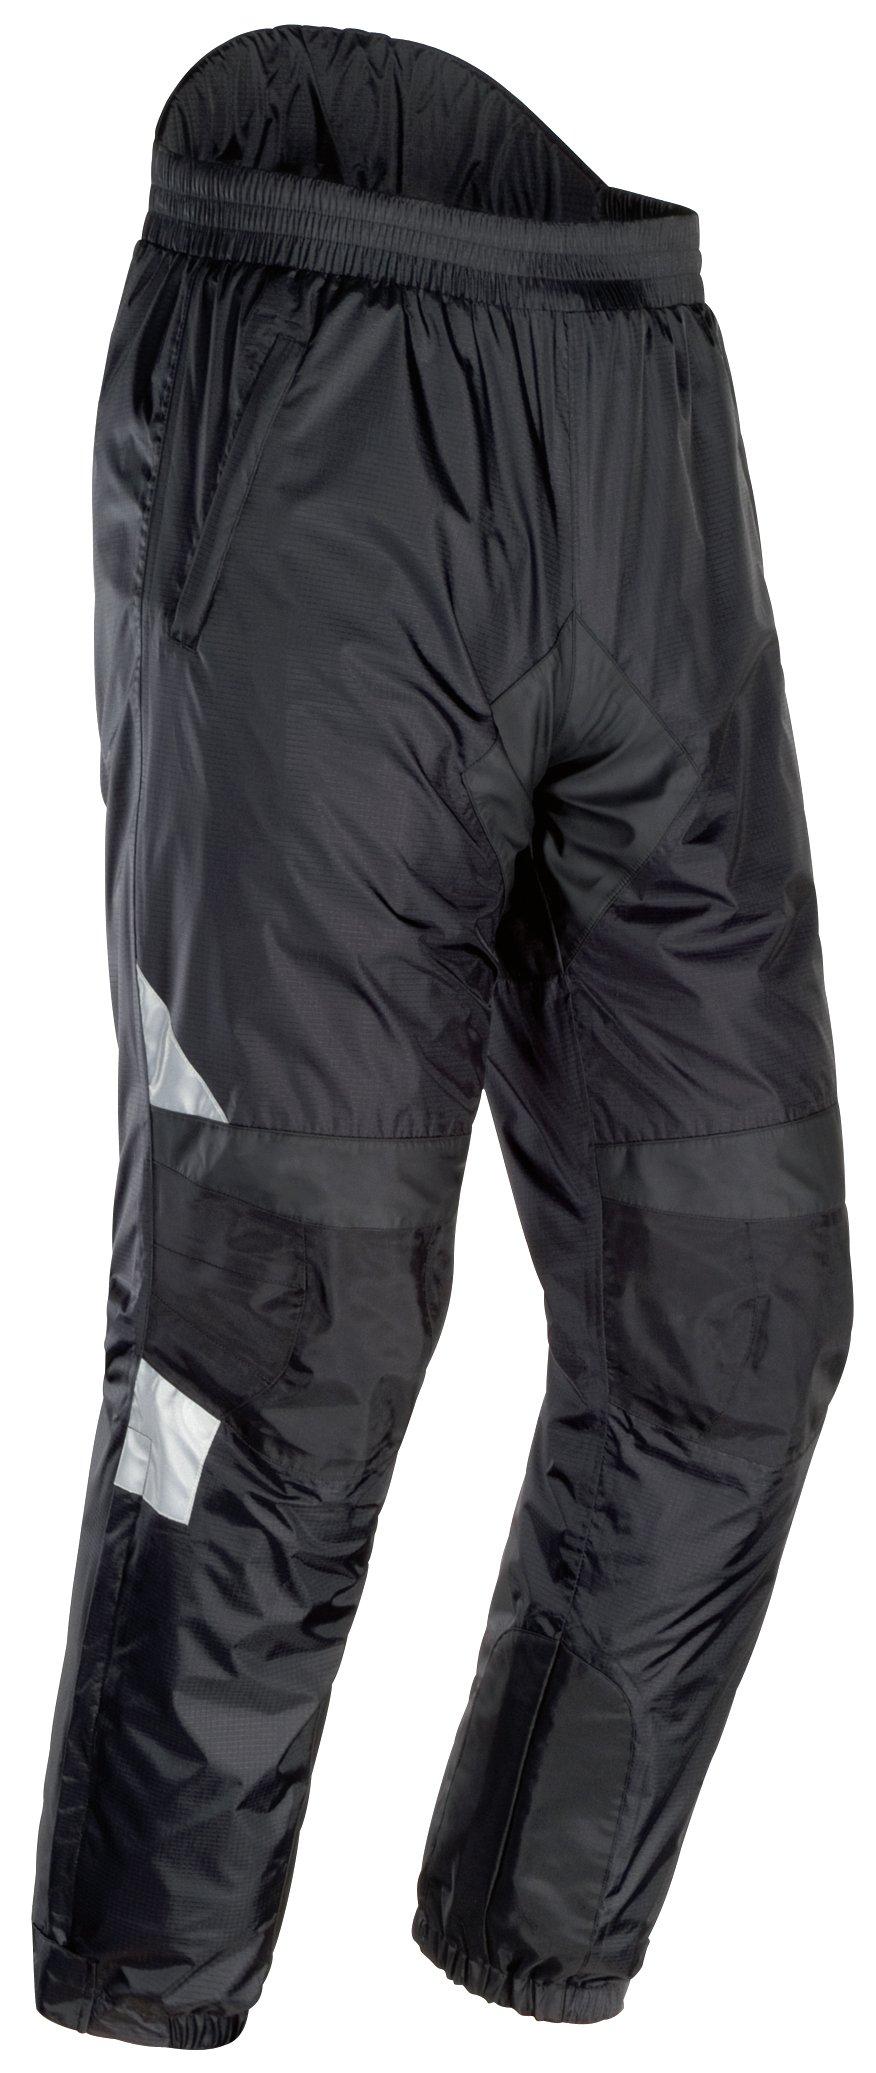 Tourmaster Women's Sentinel Rain Pants (Large Plus) (Black) by Tourmaster